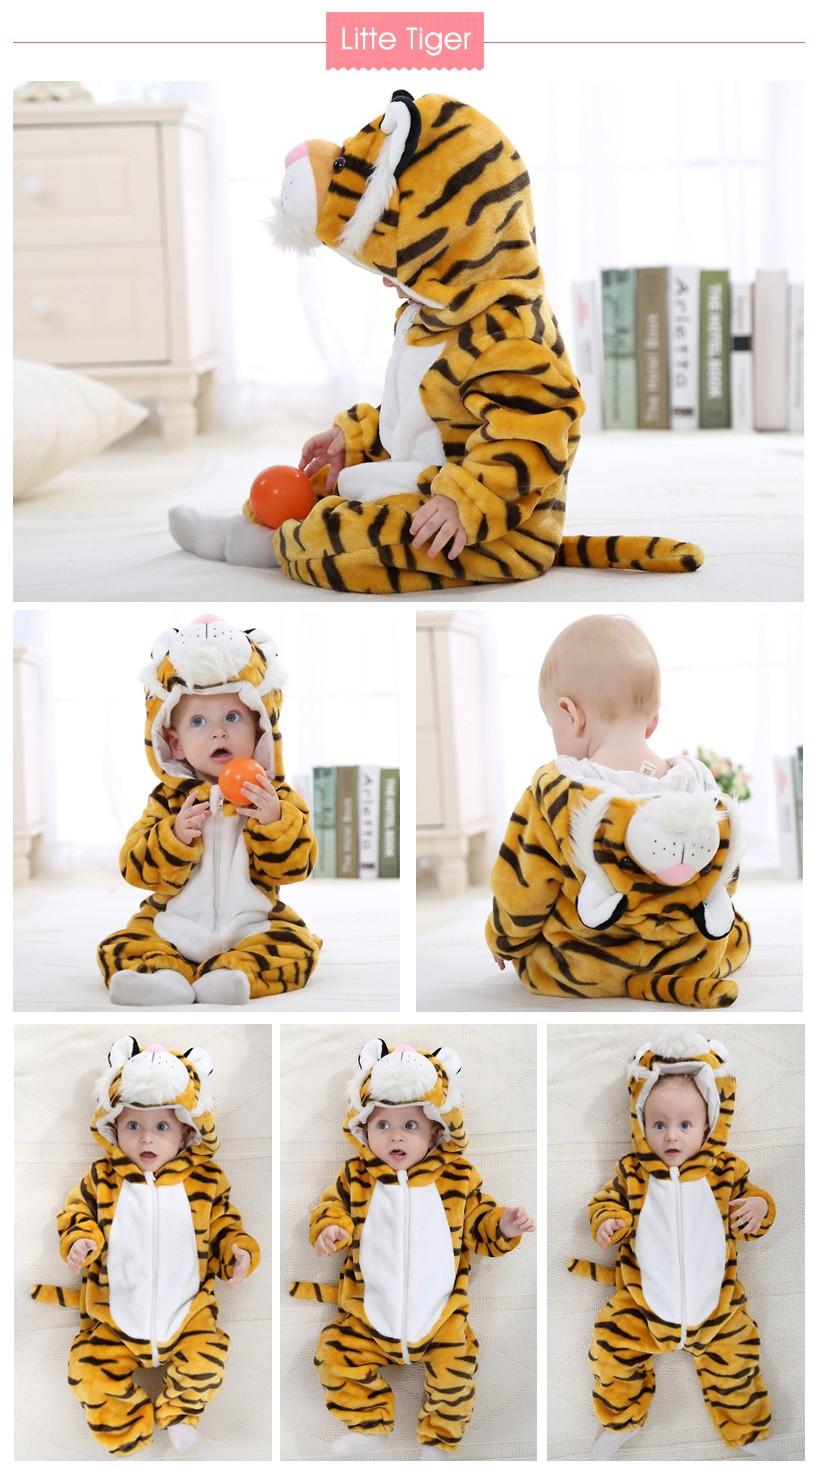 litte tiger